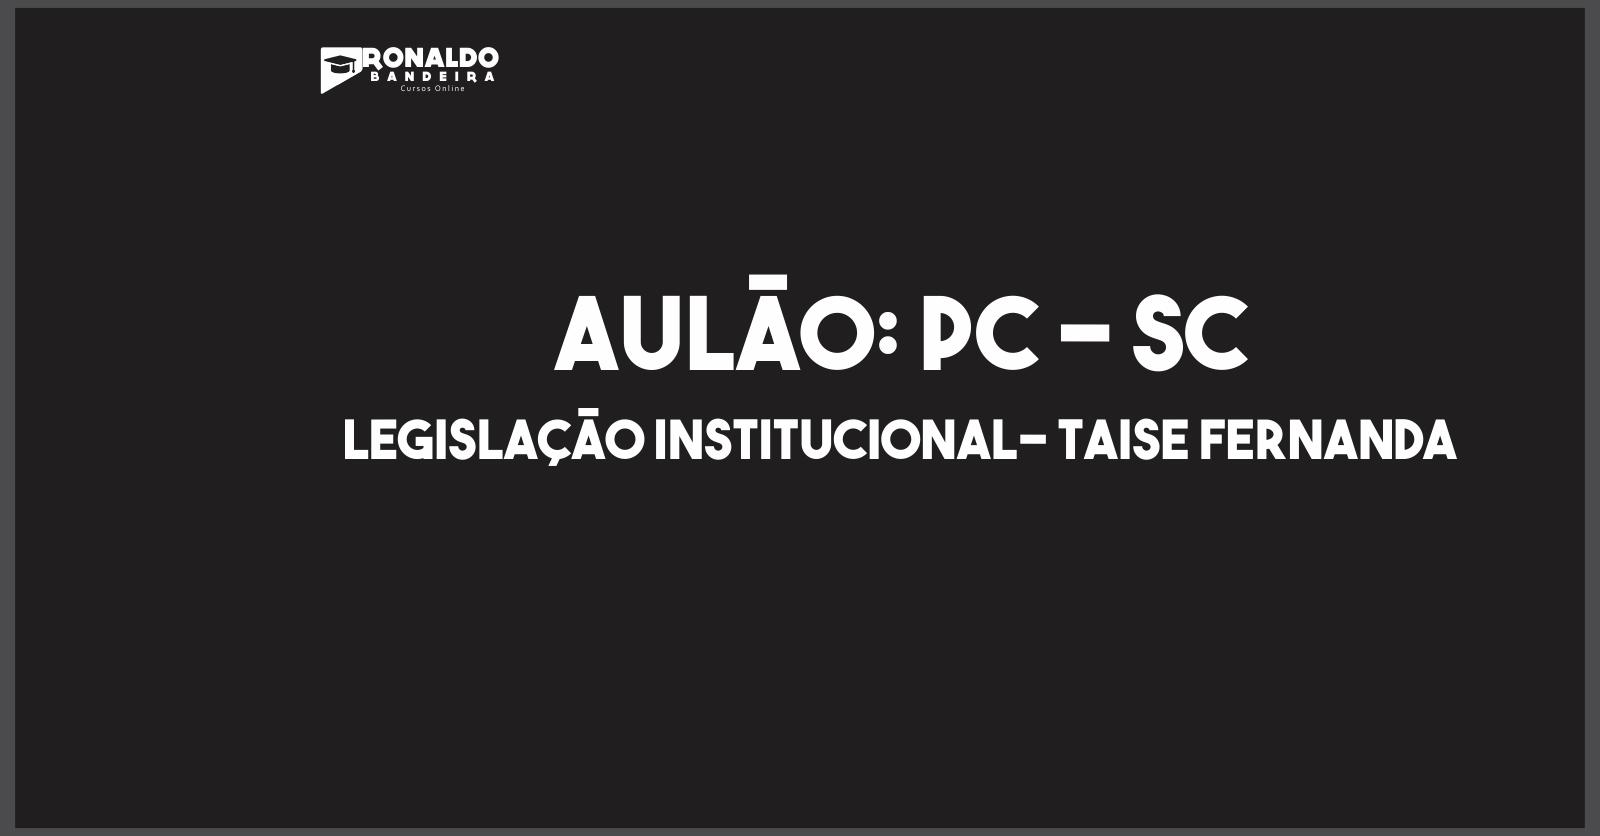 AULÃO: POLÍCIA CIVIL - SC